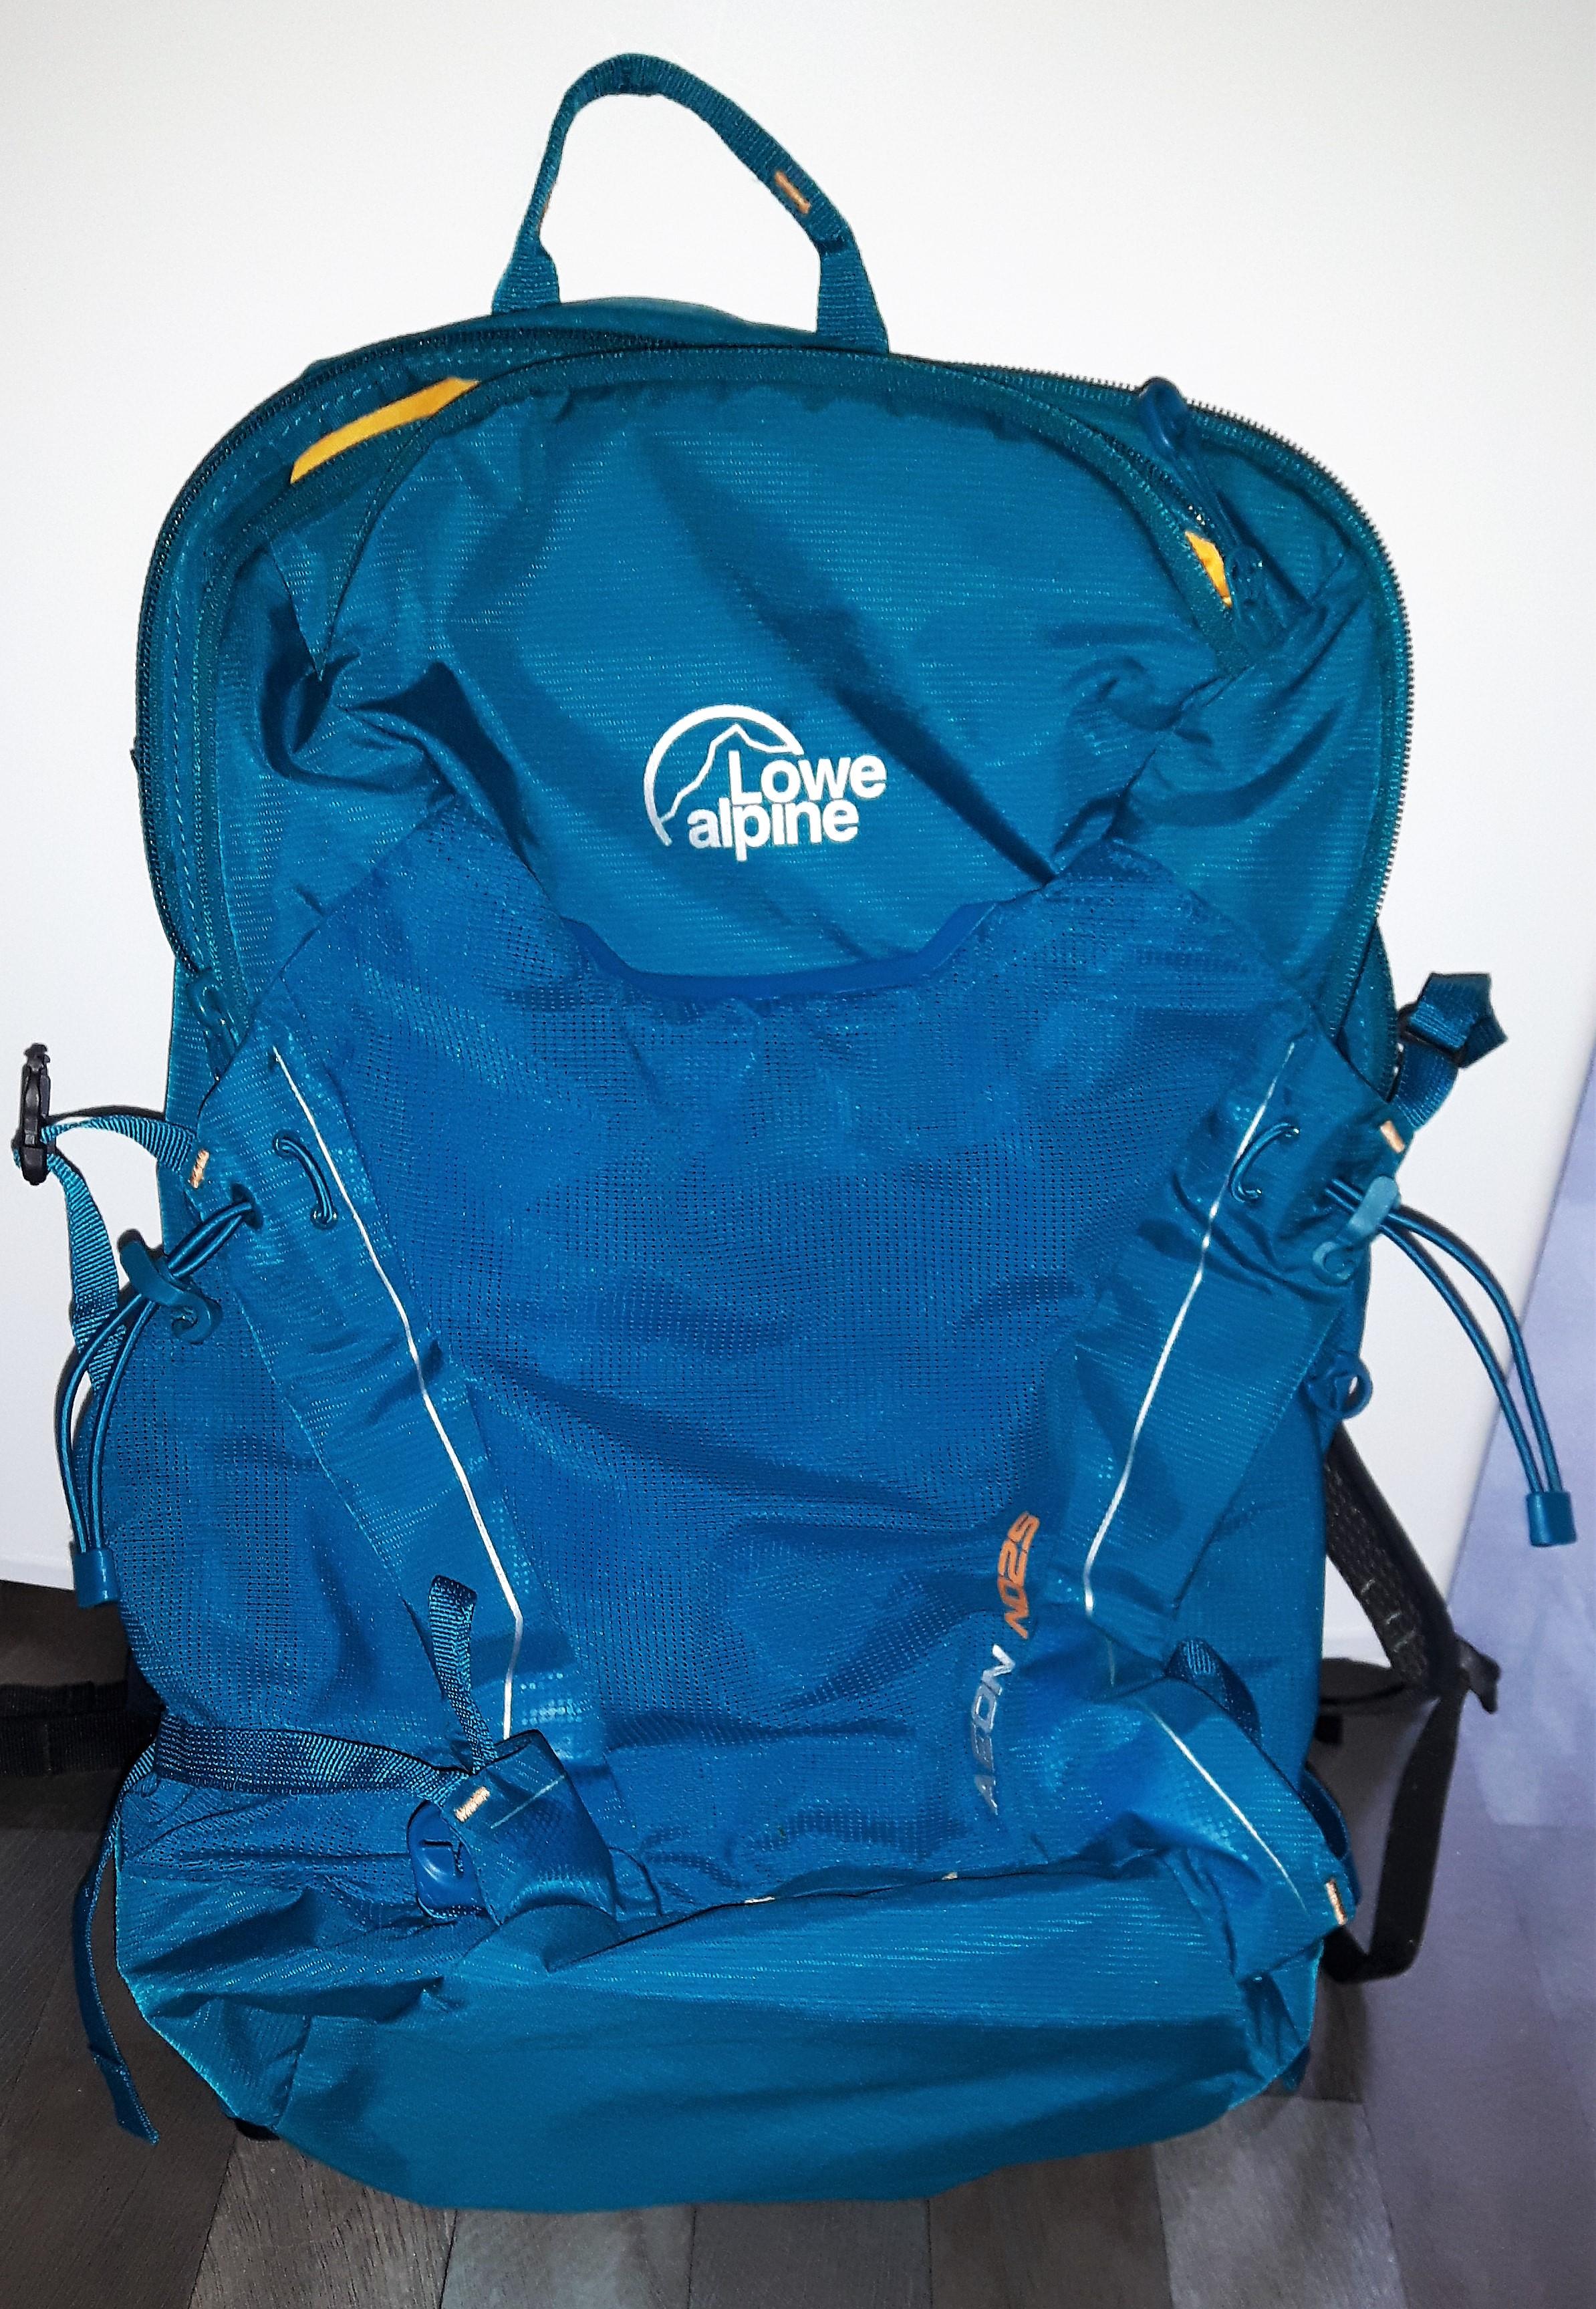 LOWE ALPINE Aeon ND25 - Daypack | OUTSIDEstories